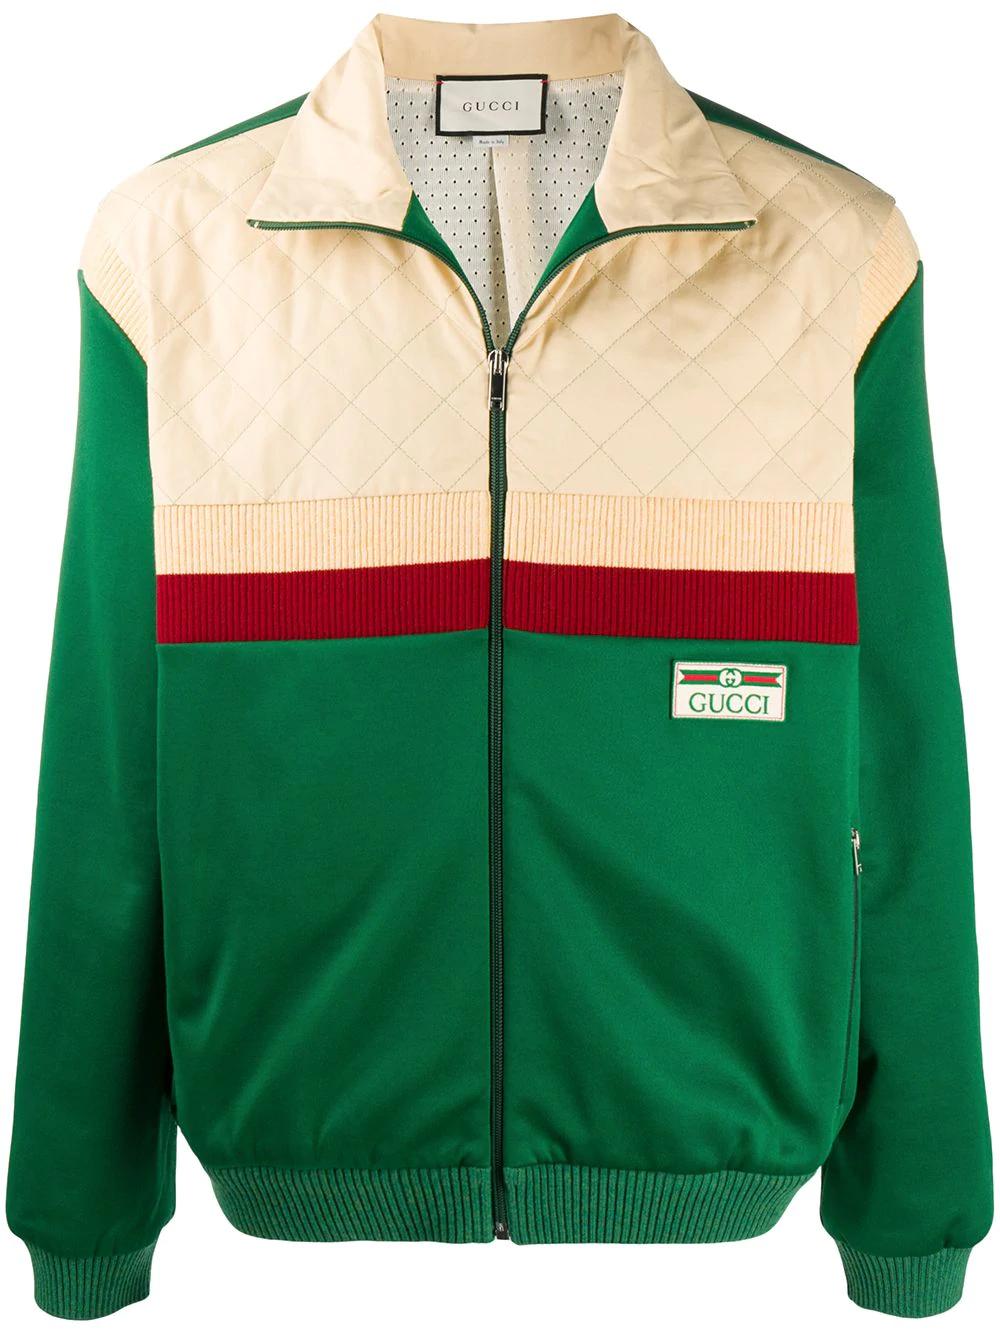 Gucci Colour Block Bomber Jacket Farfetch Bomber Jacket Green Bomber Jacket Designer Clothes For Men [ 1334 x 1000 Pixel ]